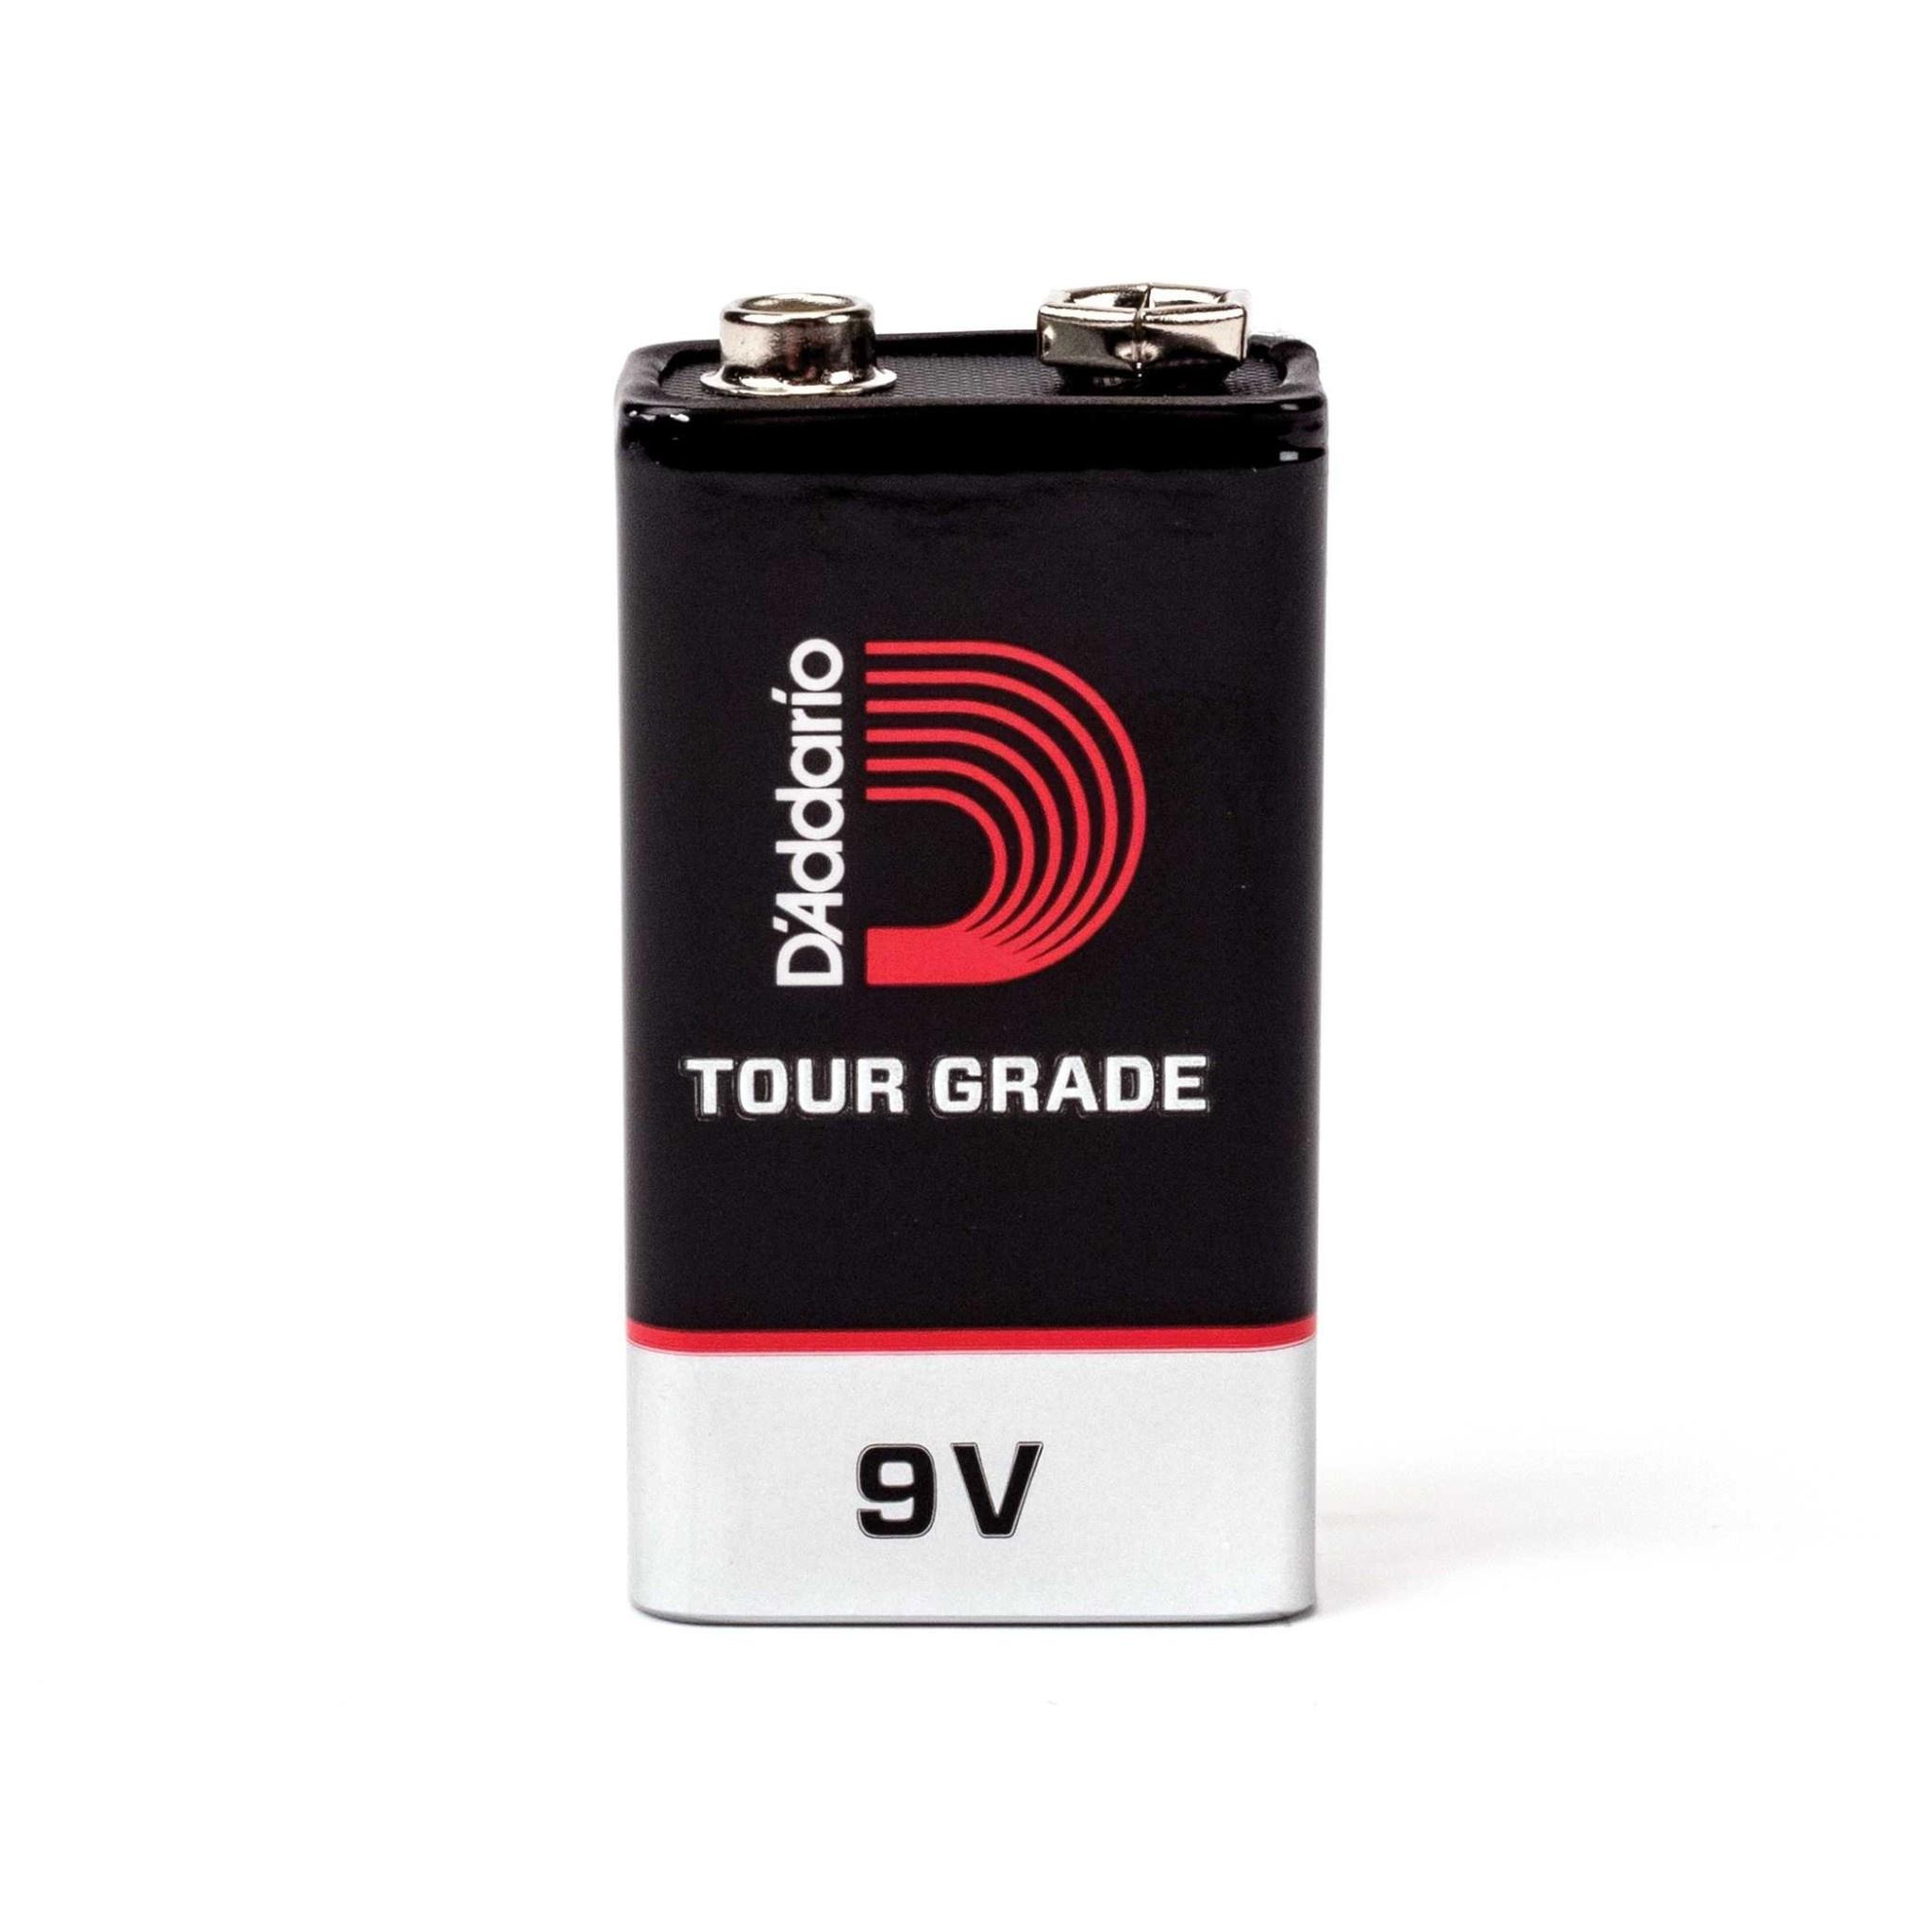 D'addario 9V Battery 2 pack-1